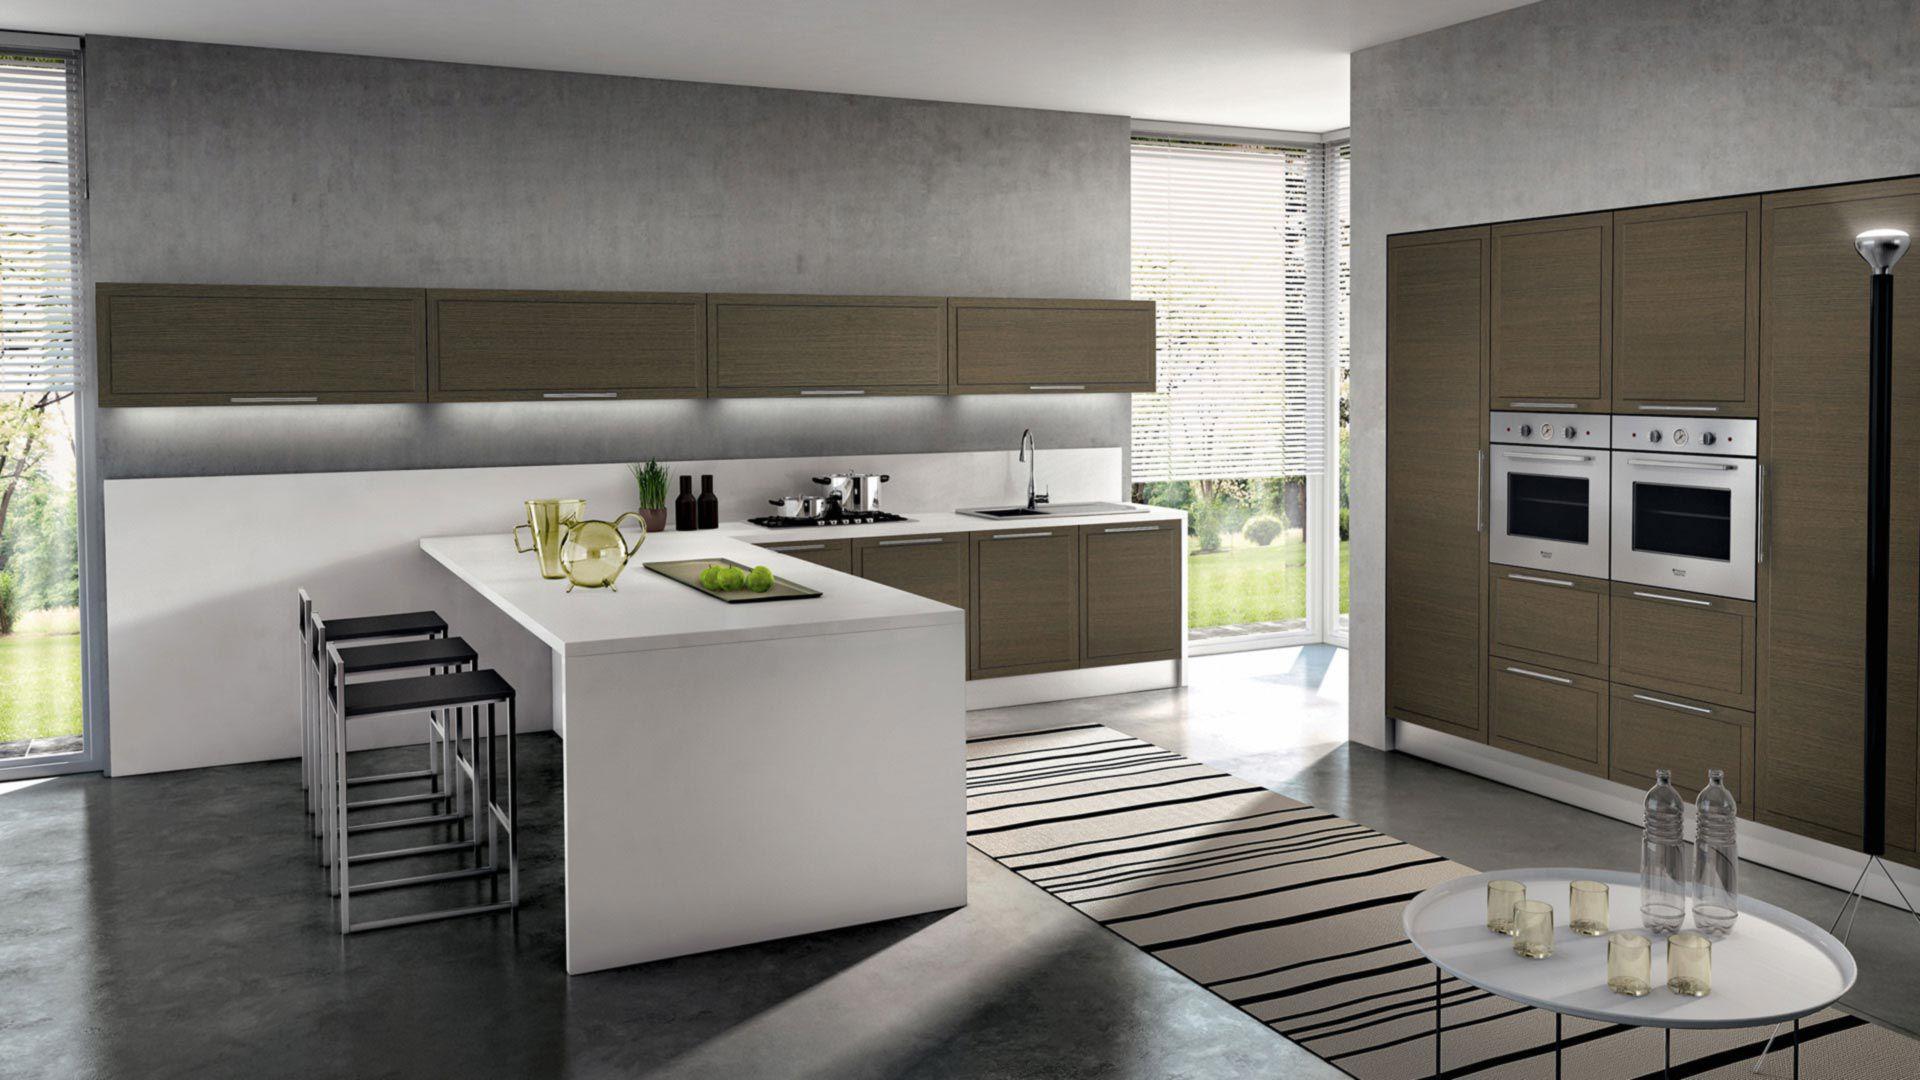 Cucina moderna / in legno / a L - DIADEMA : COMPOSITION 01 ...